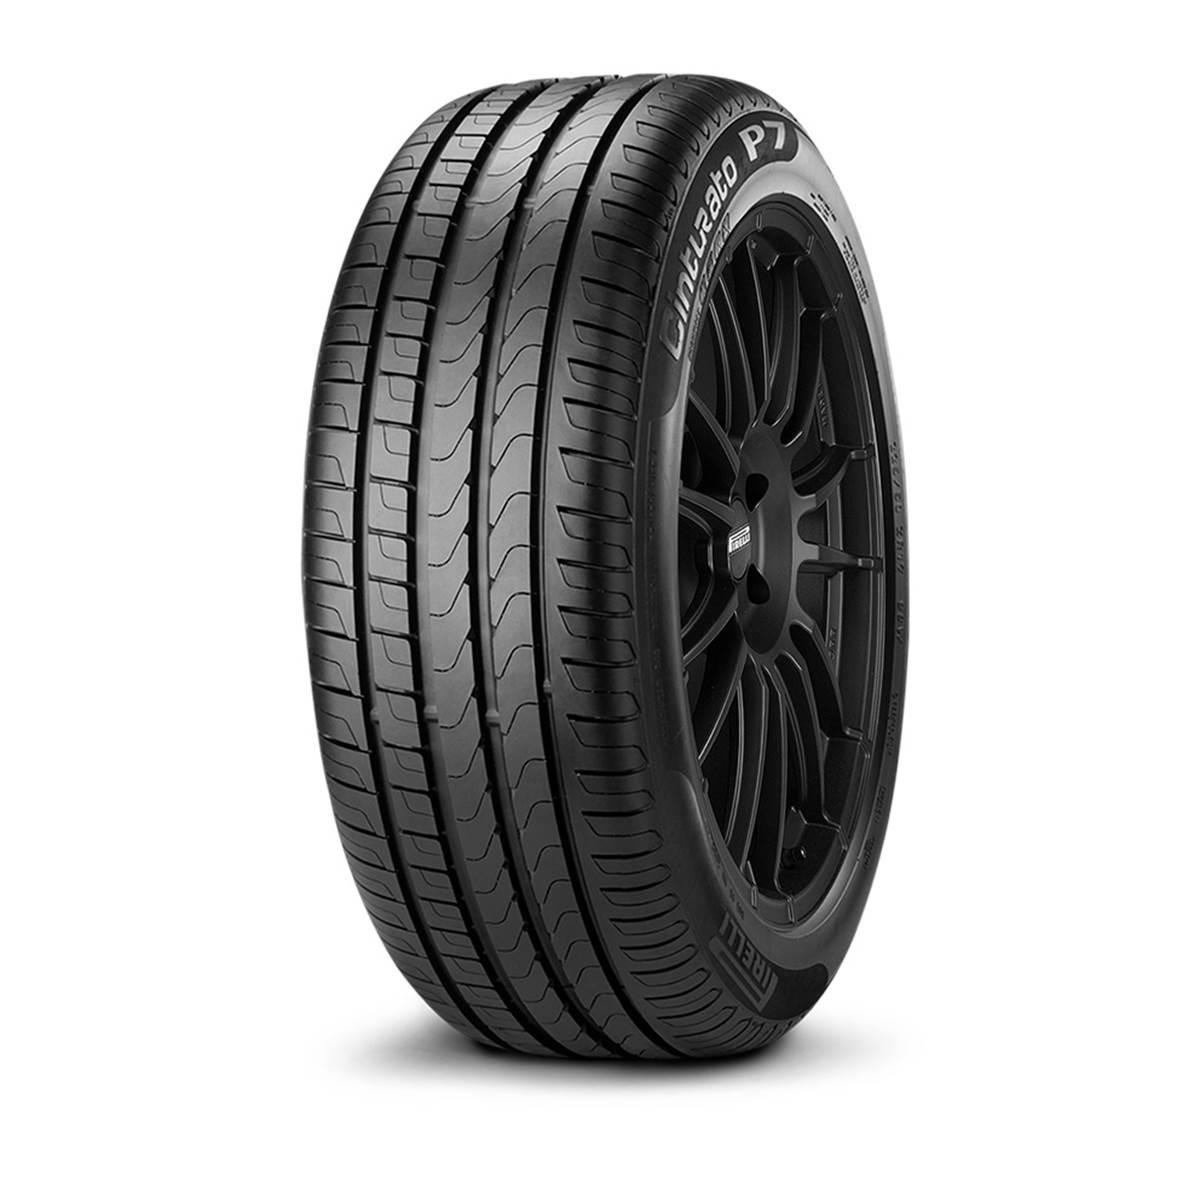 Pneu Pirelli 225/50R17 98W Cinturato P7 XL